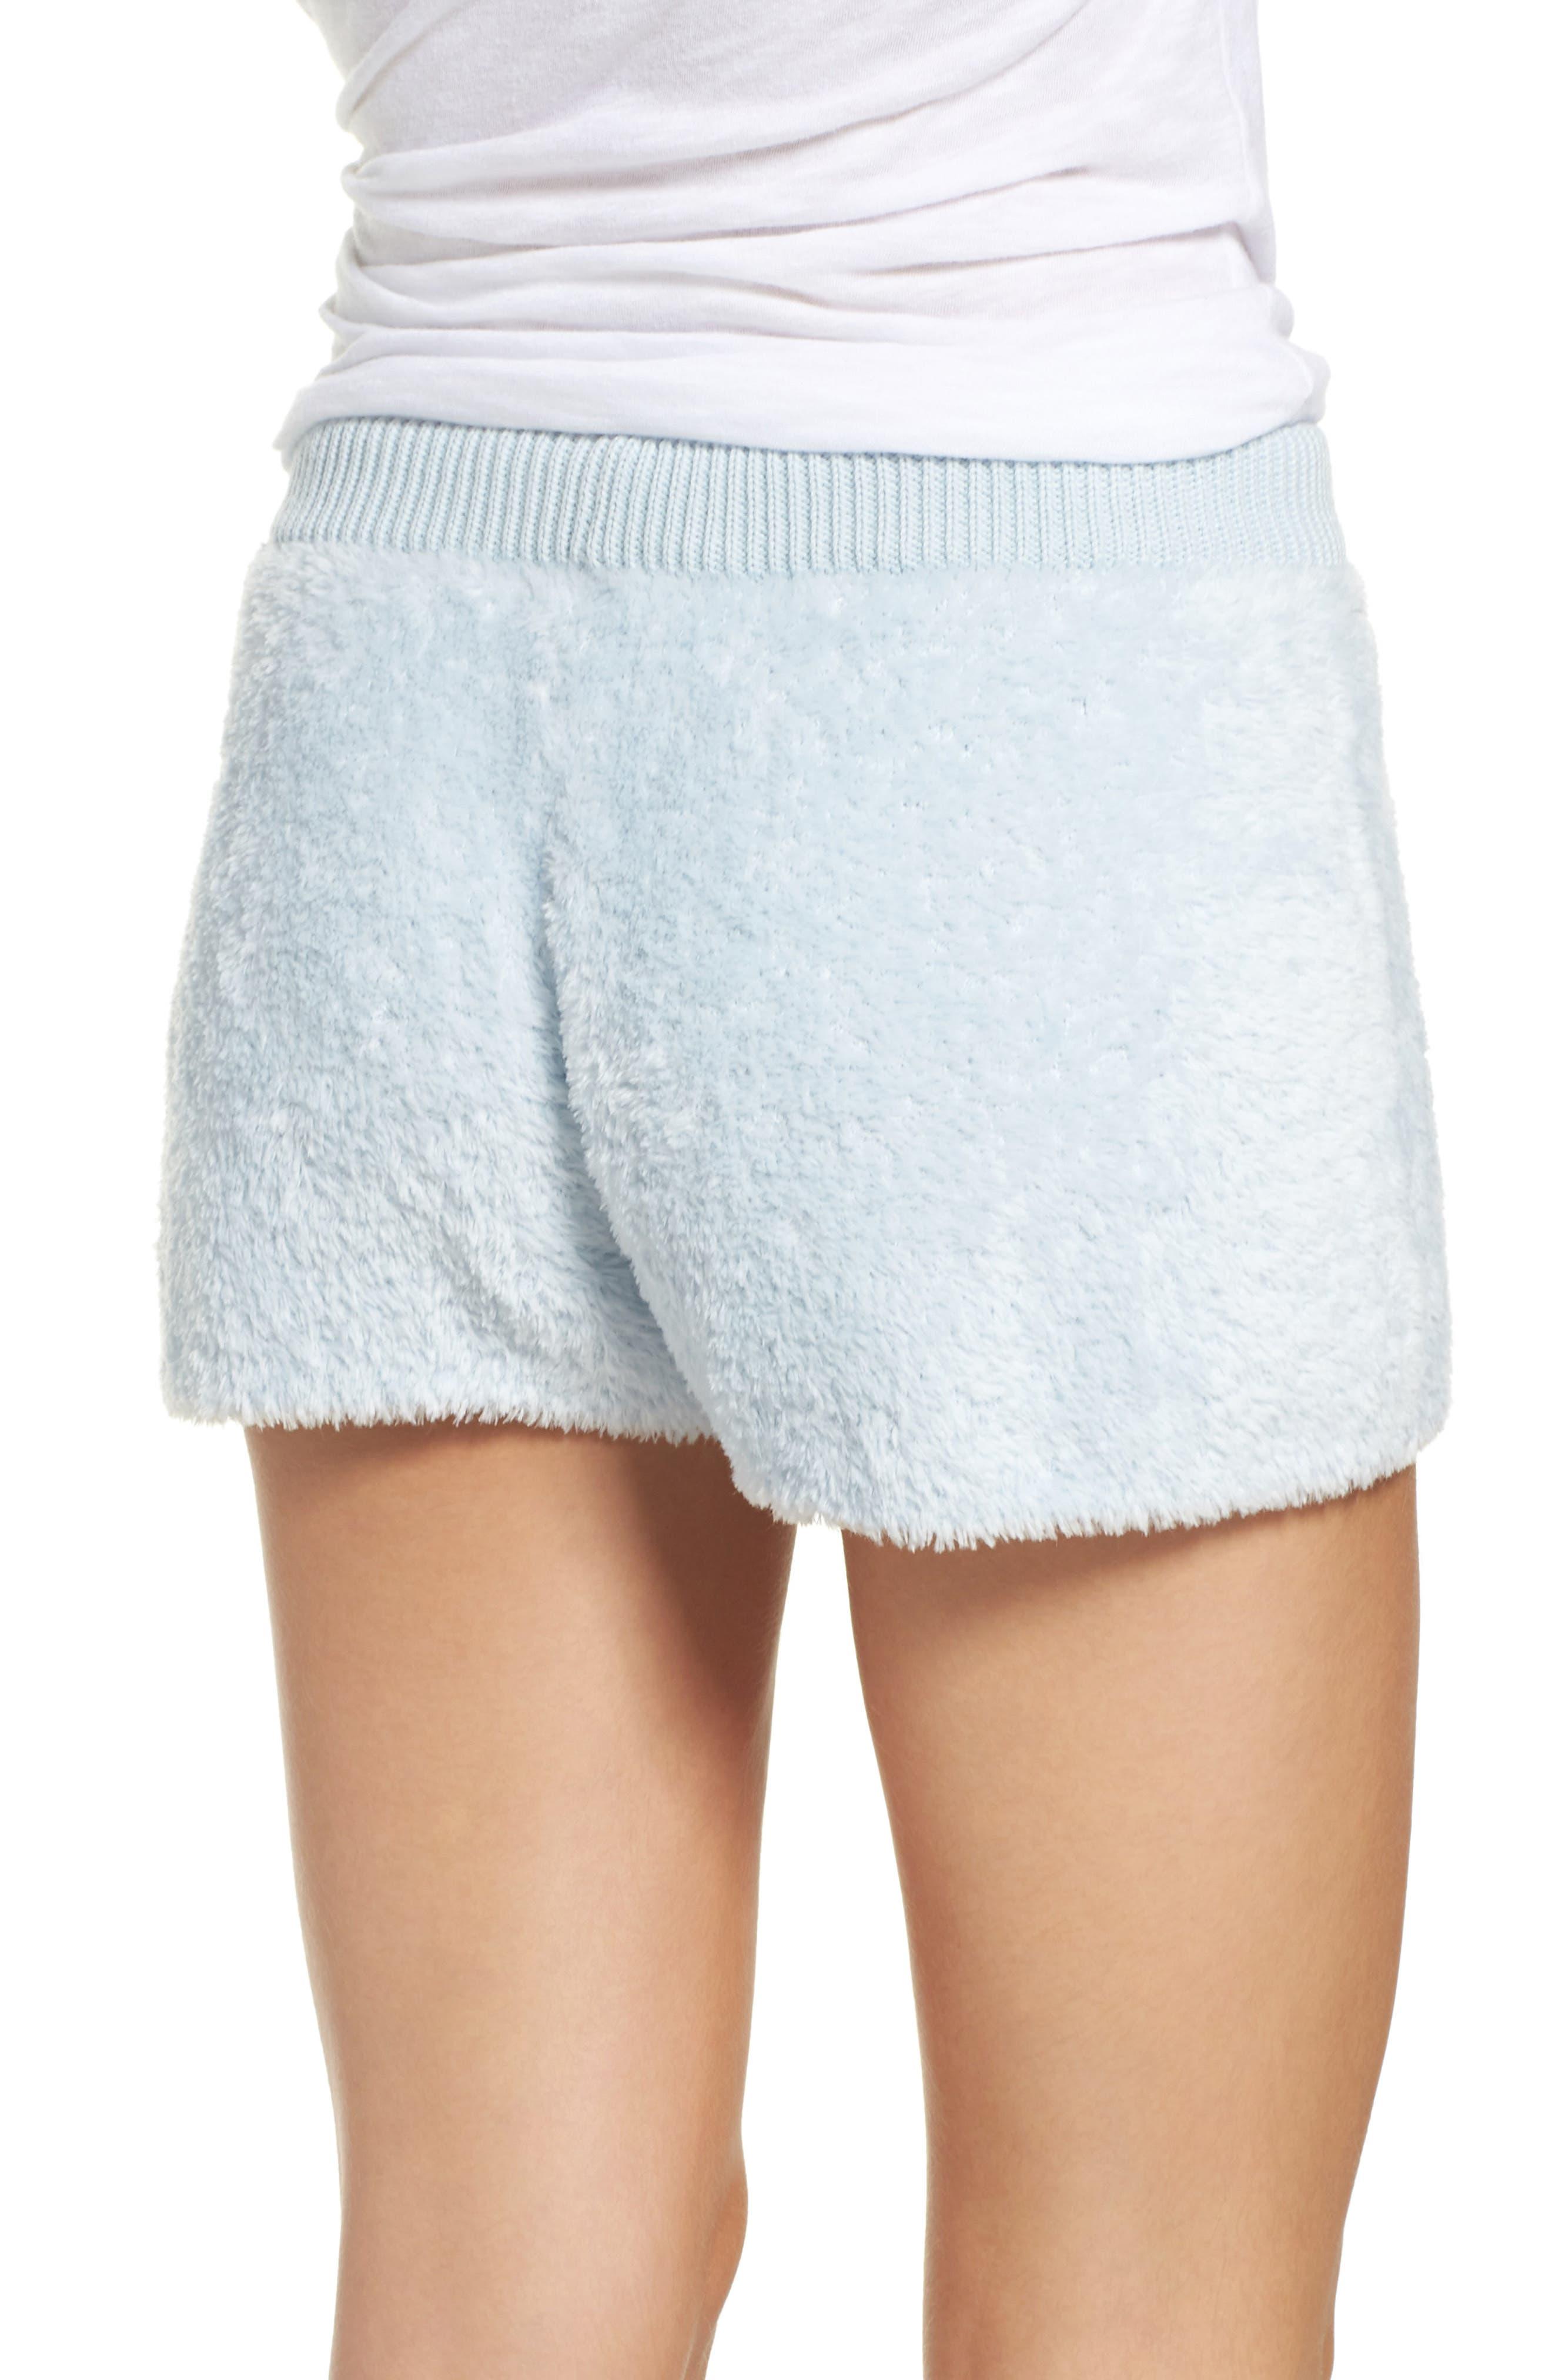 Fuzzy Lounge Shorts,                             Alternate thumbnail 2, color,                             Blue Drift